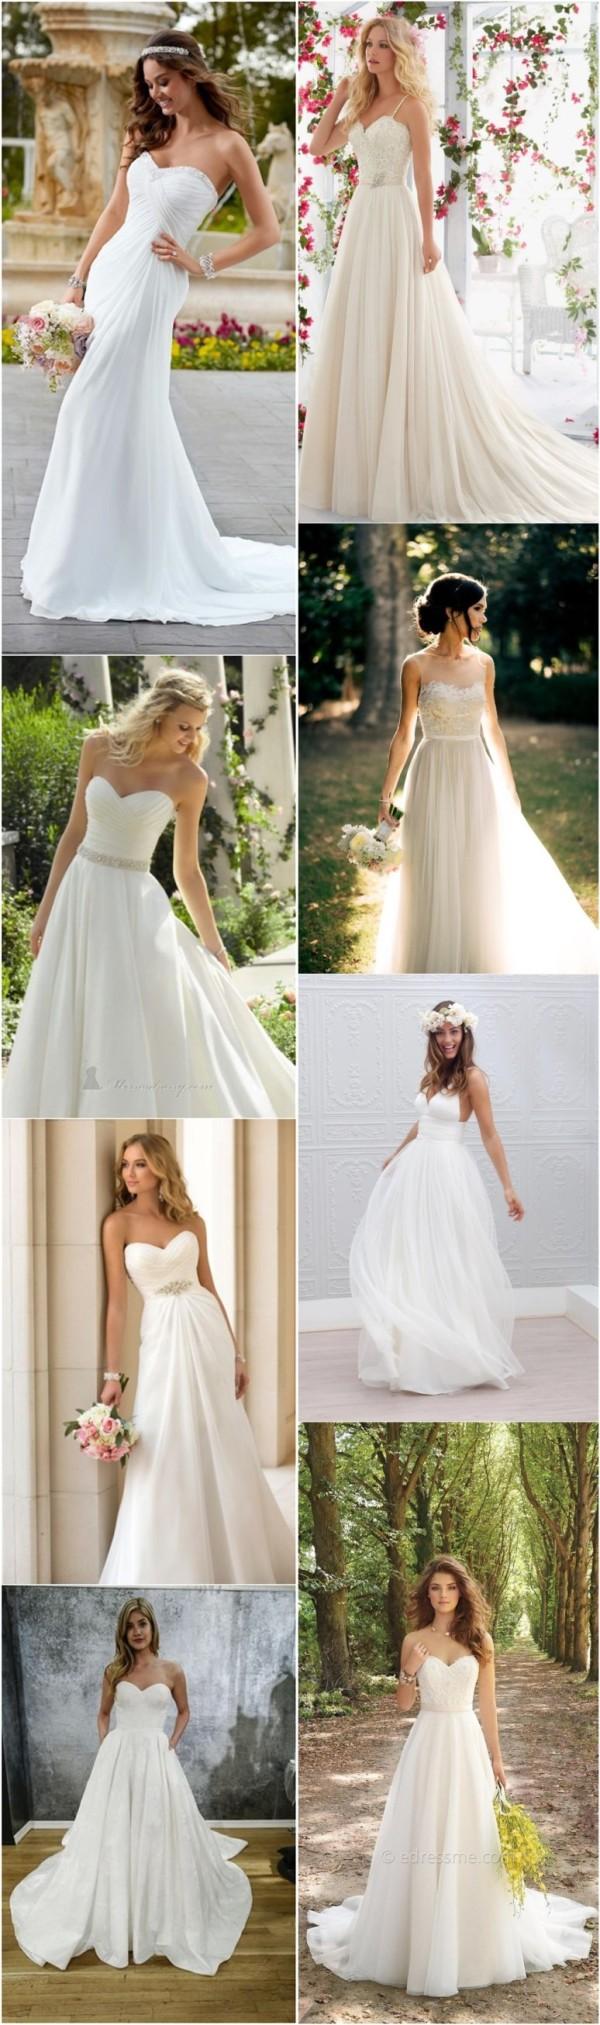 Simple and Elegant white wedding dresses